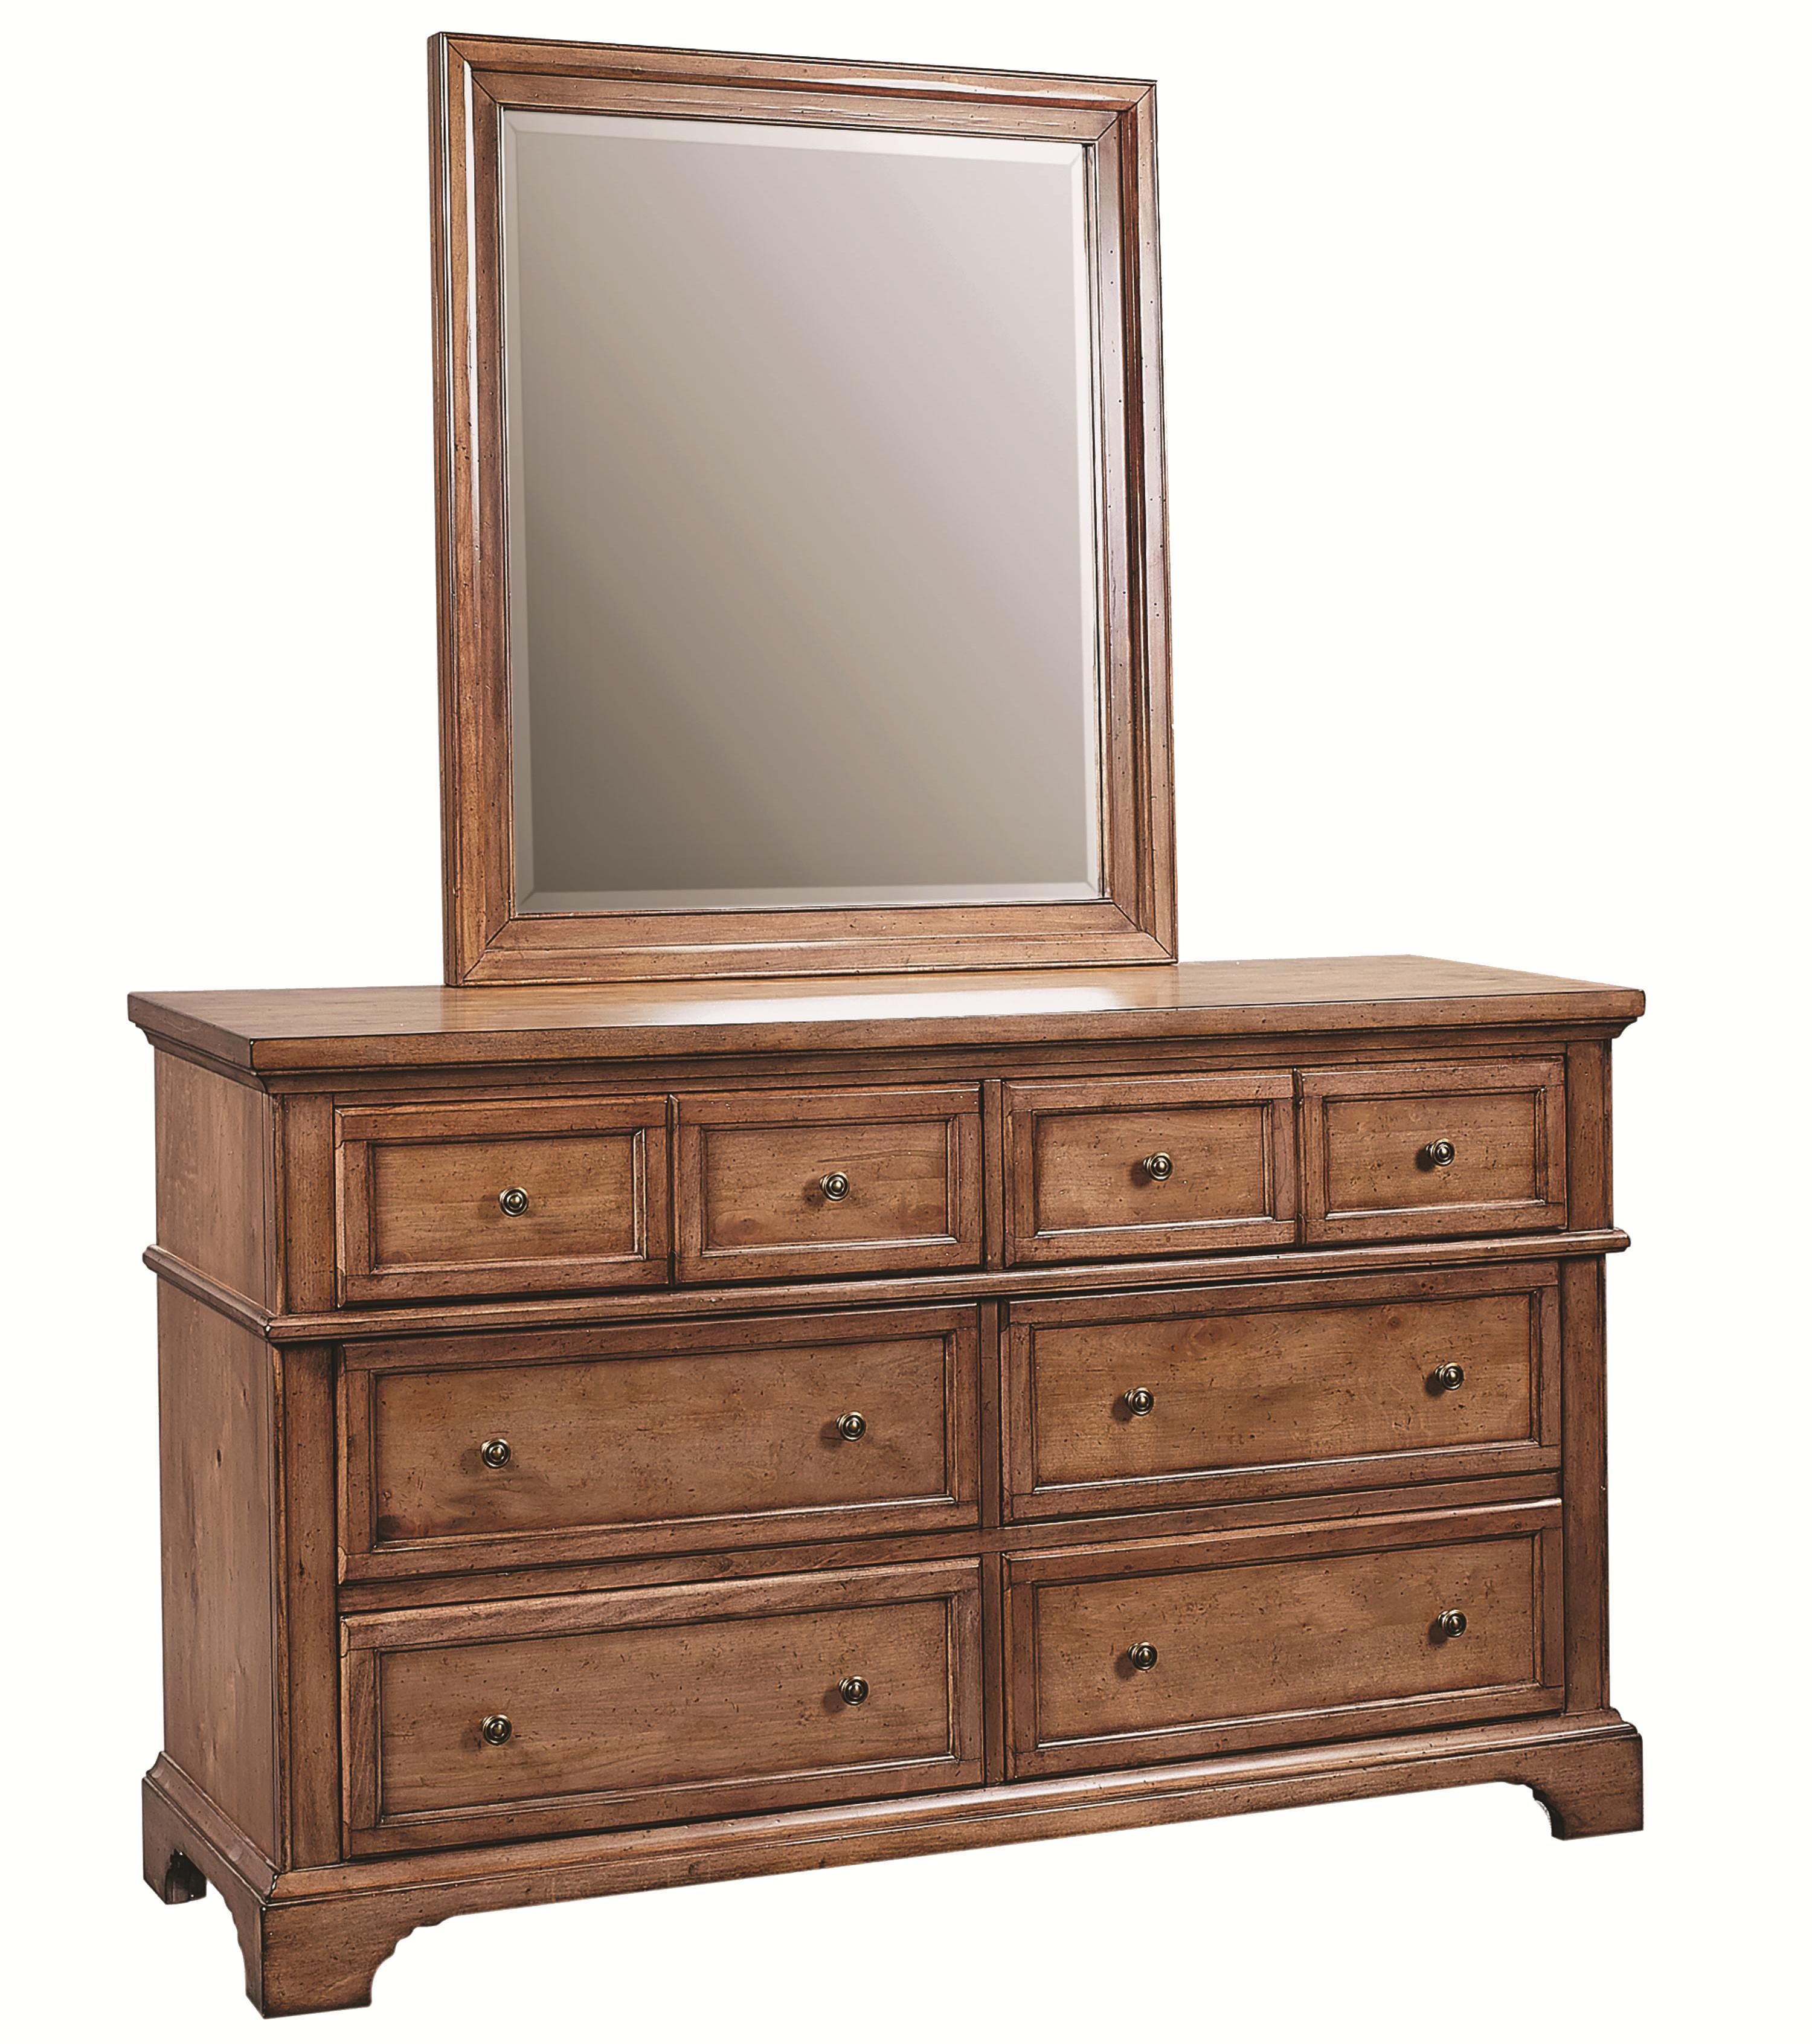 Alder Creek Dresser and Mirror Set by Aspenhome at Stoney Creek Furniture